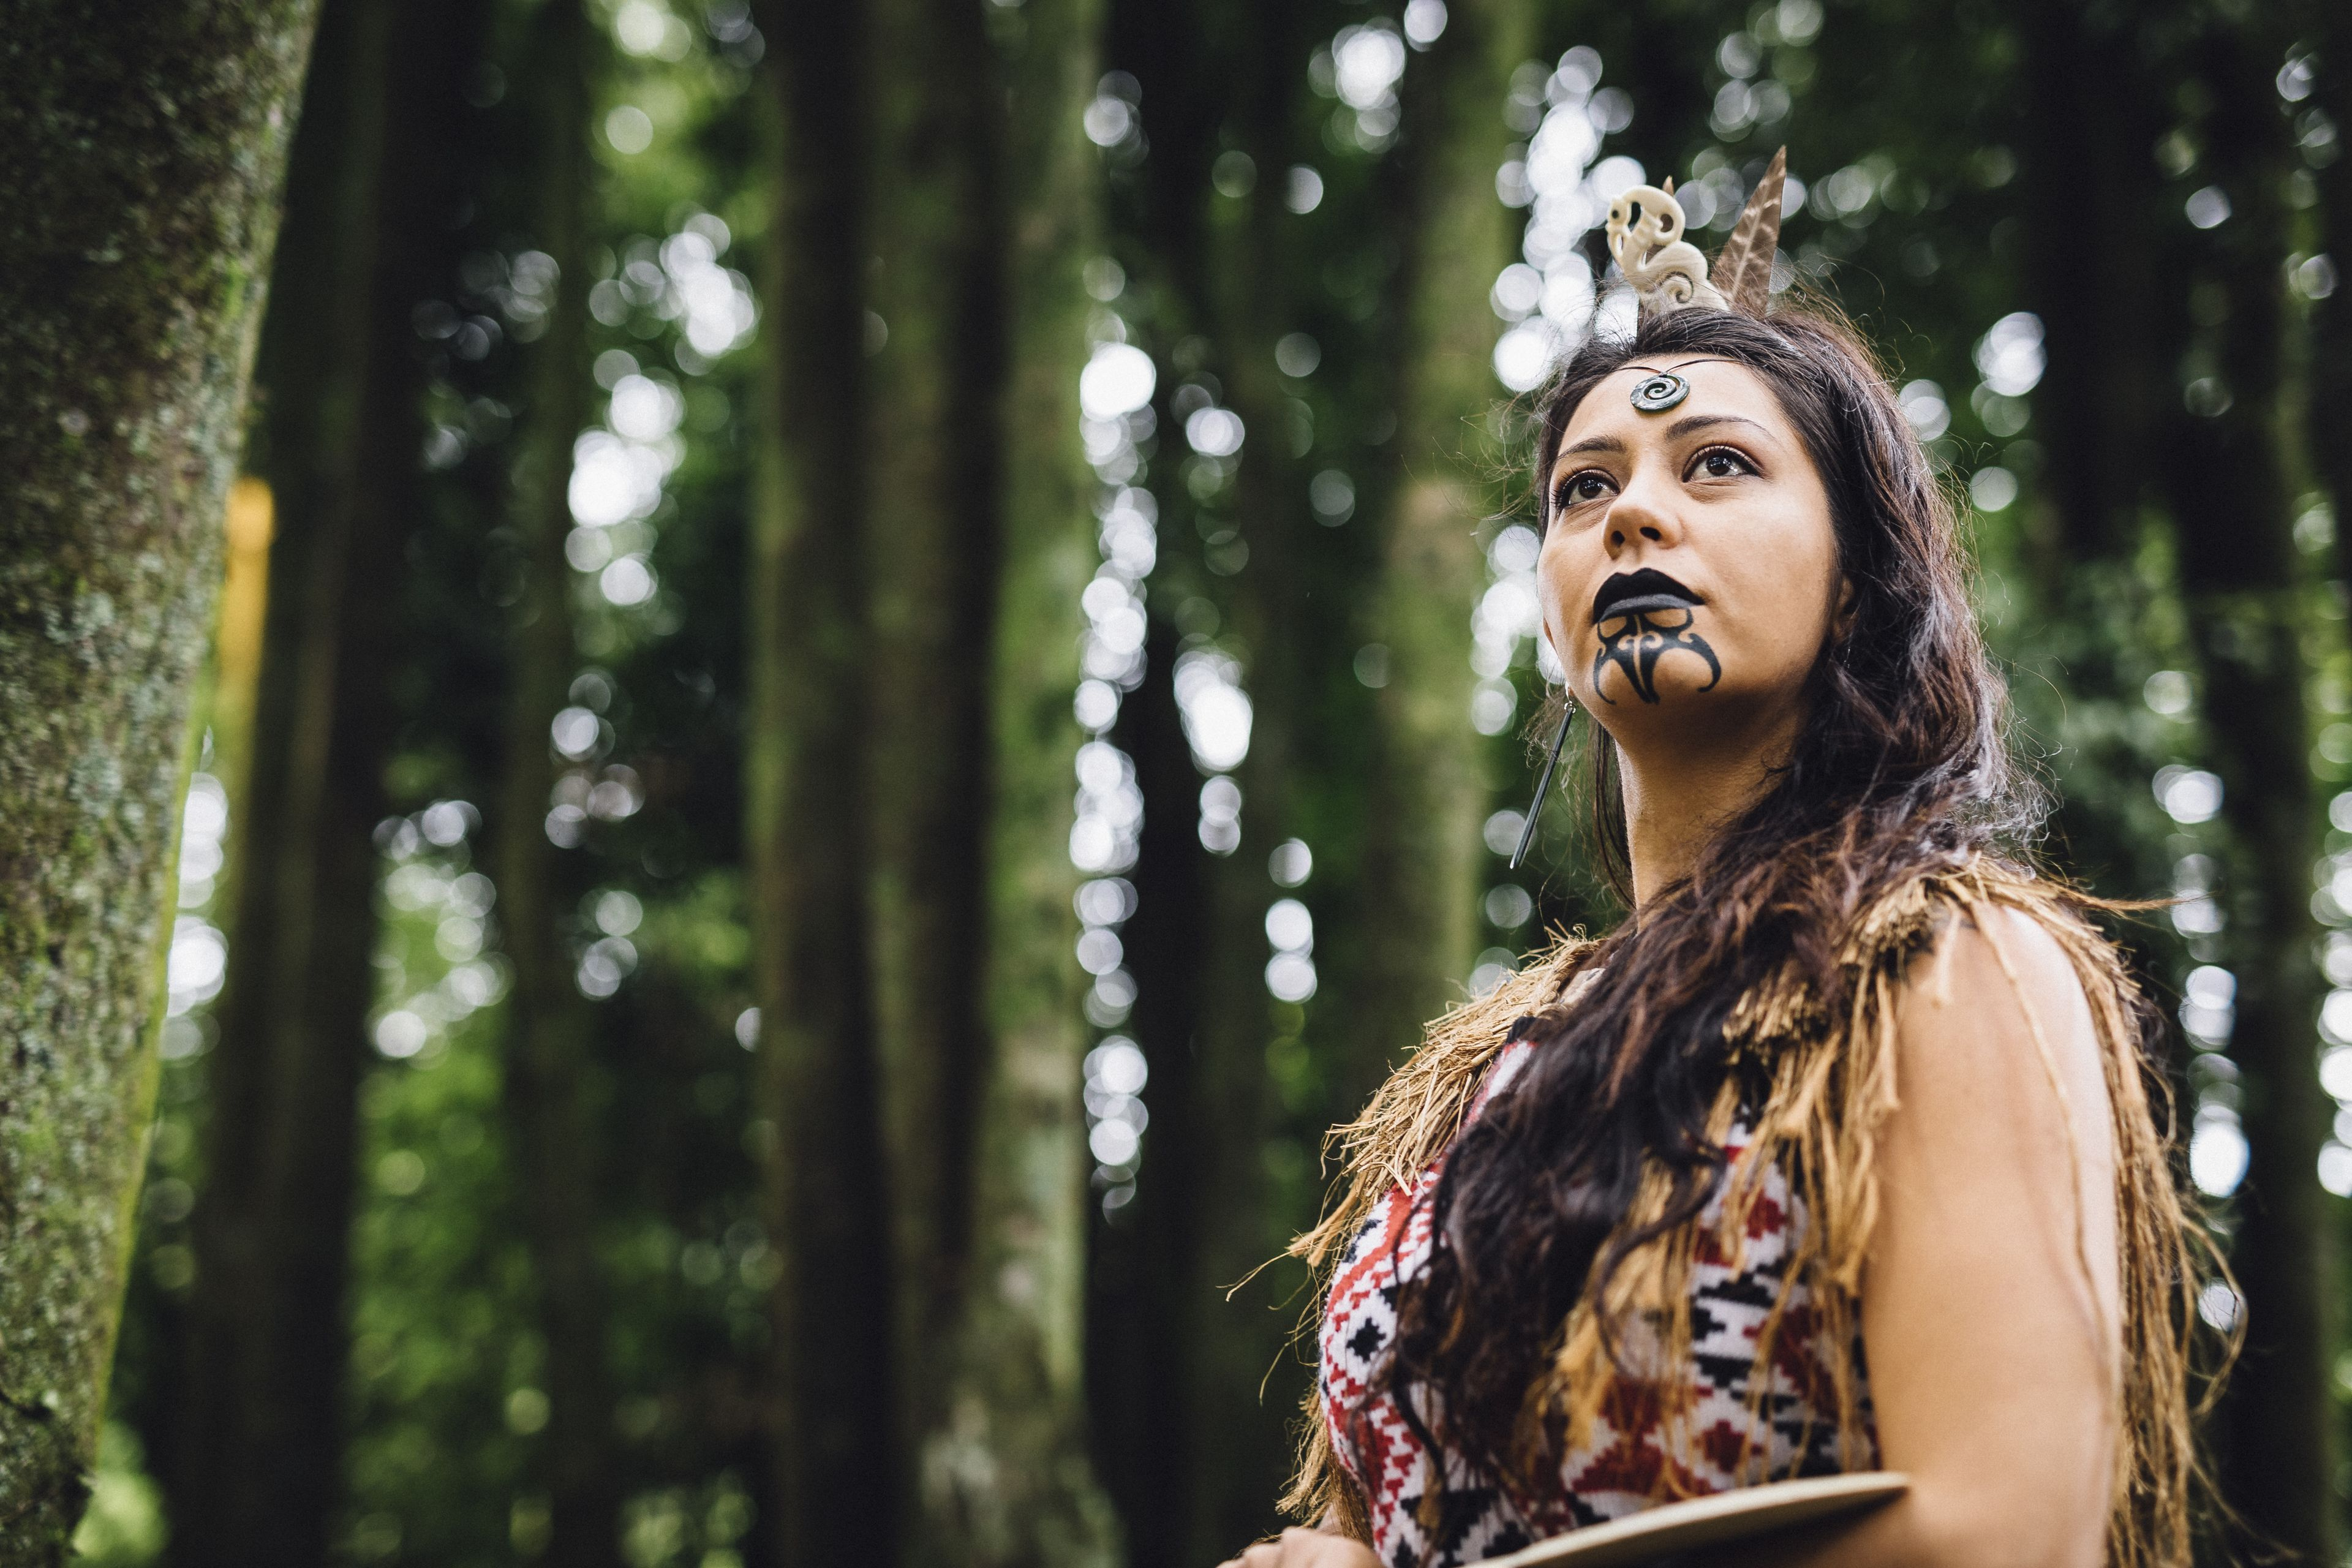 Tamaki Maori Village Cultural Discovery & Hangi Feast